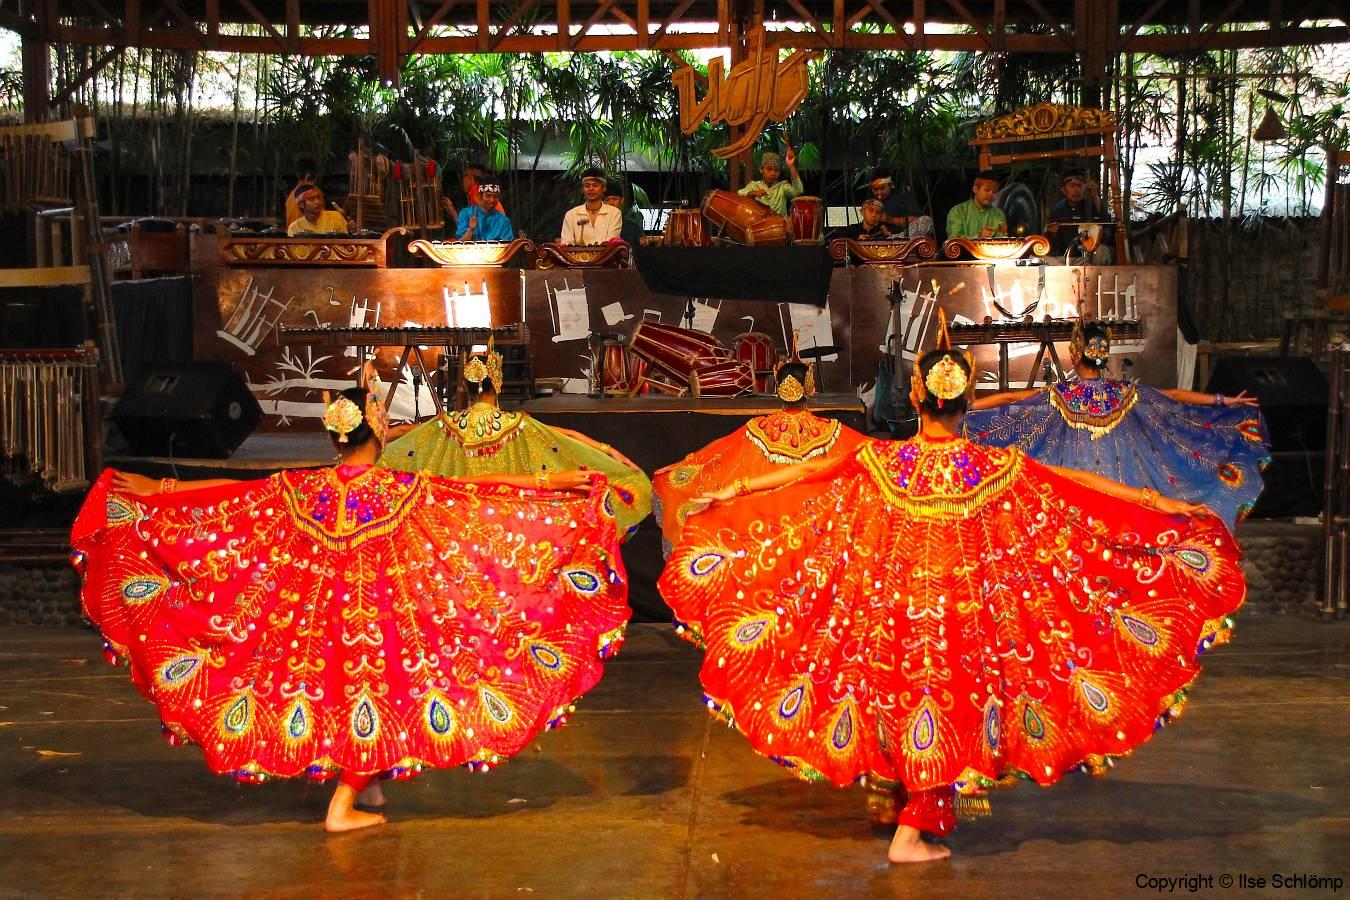 Java, Padasuka, Bambus Musik-Orchester, Tanzaufführung